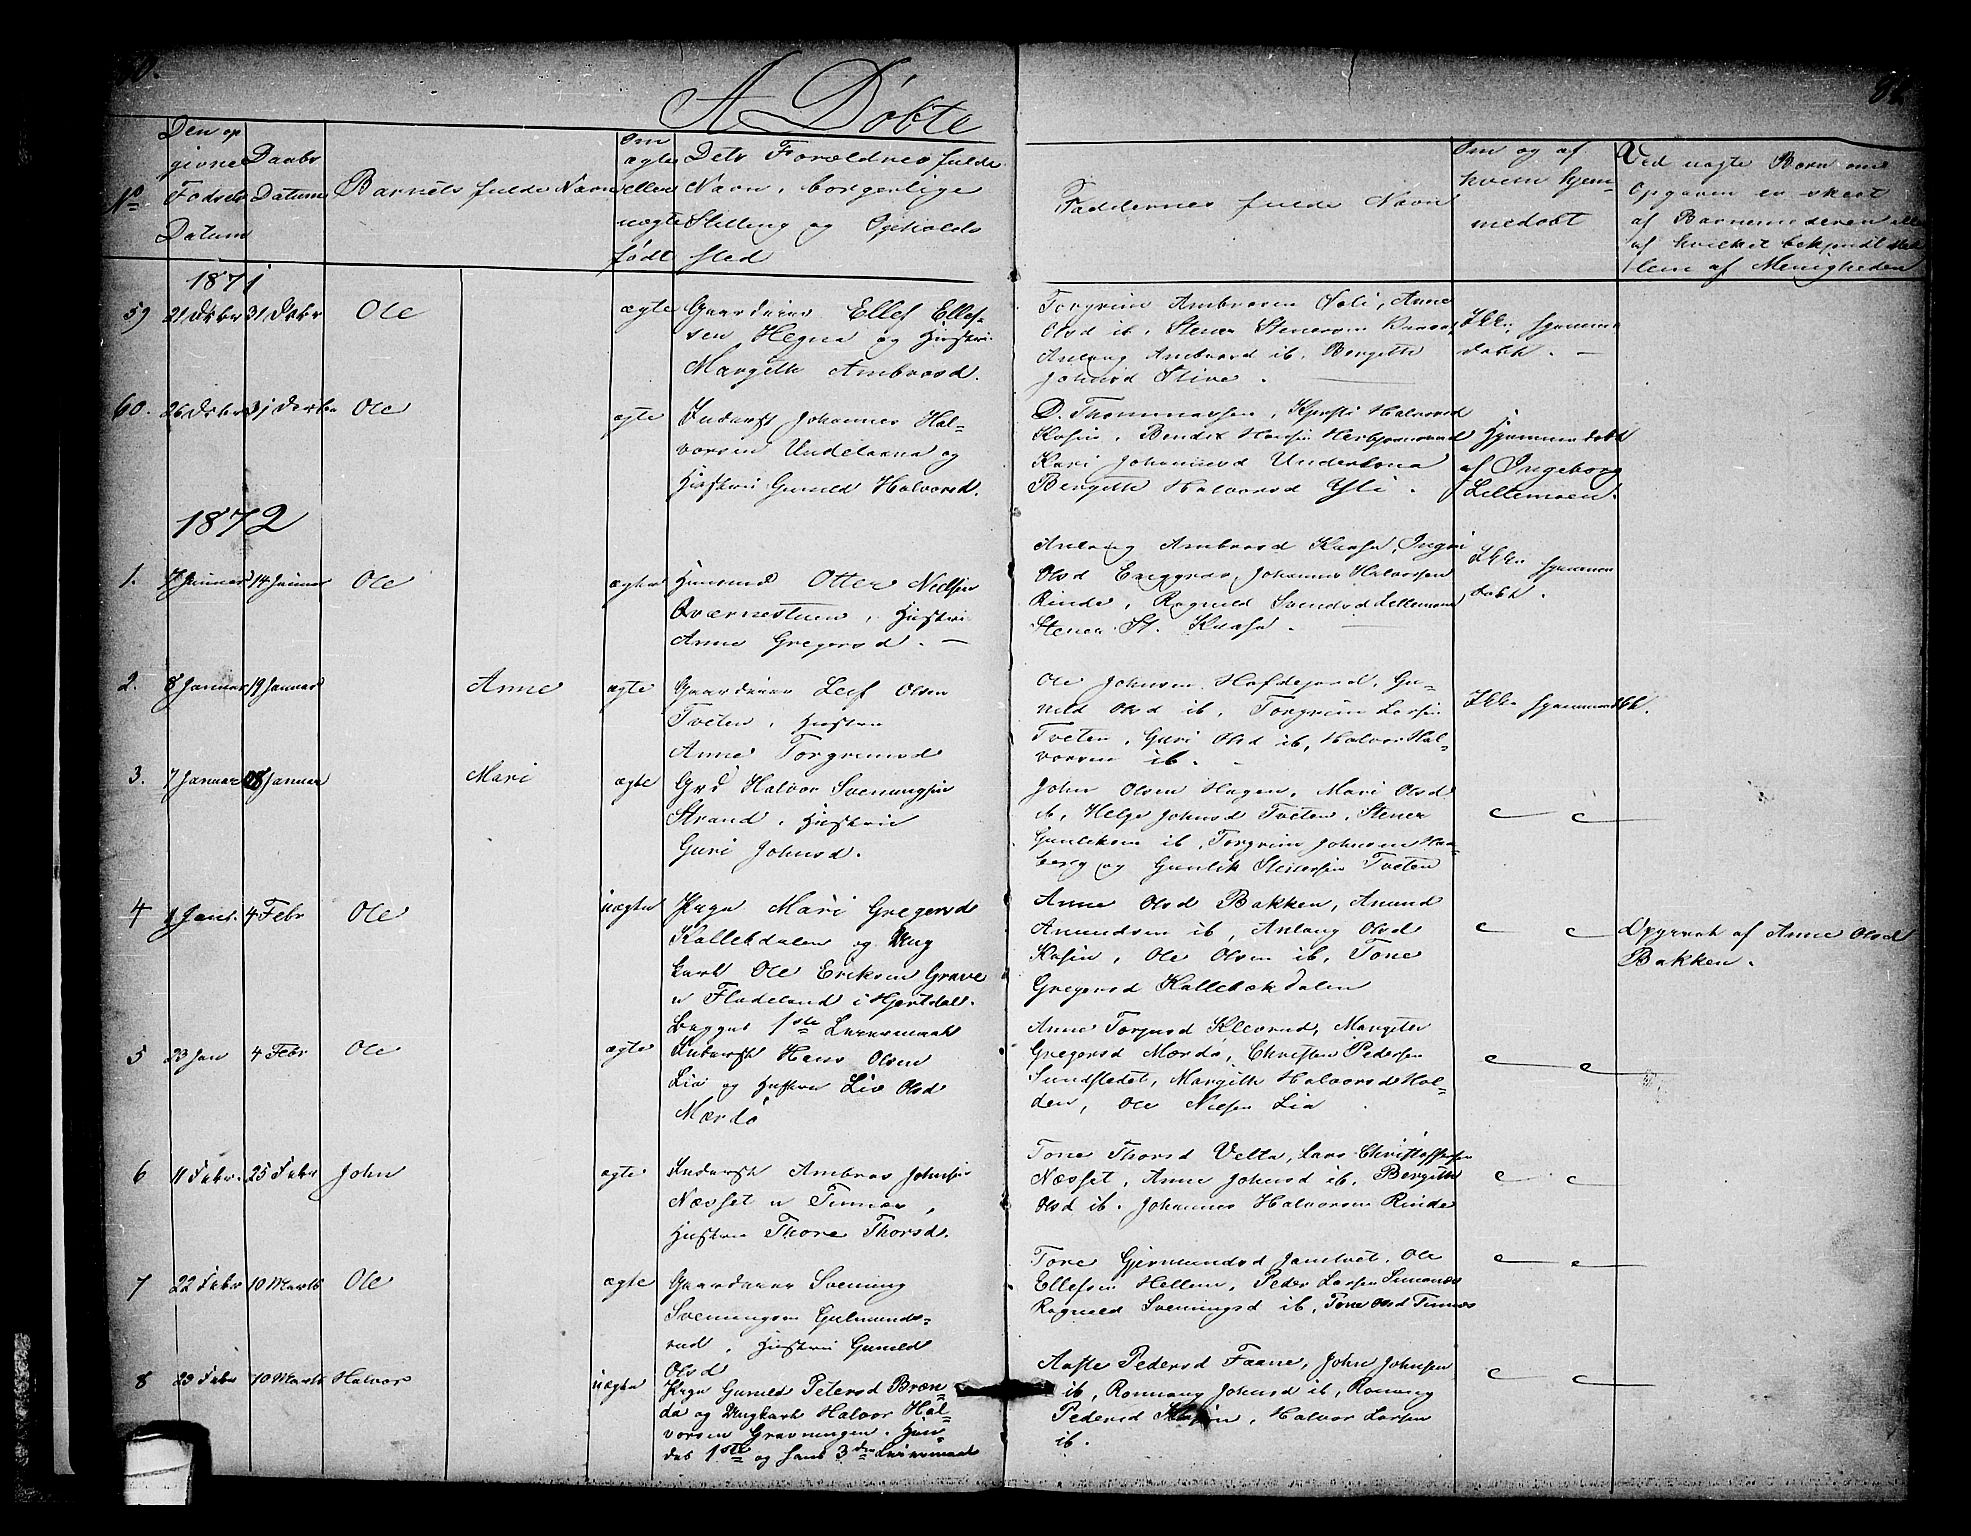 SAKO, Heddal kirkebøker, G/Ga/L0001: Klokkerbok nr. I 1, 1866-1878, s. 80-81